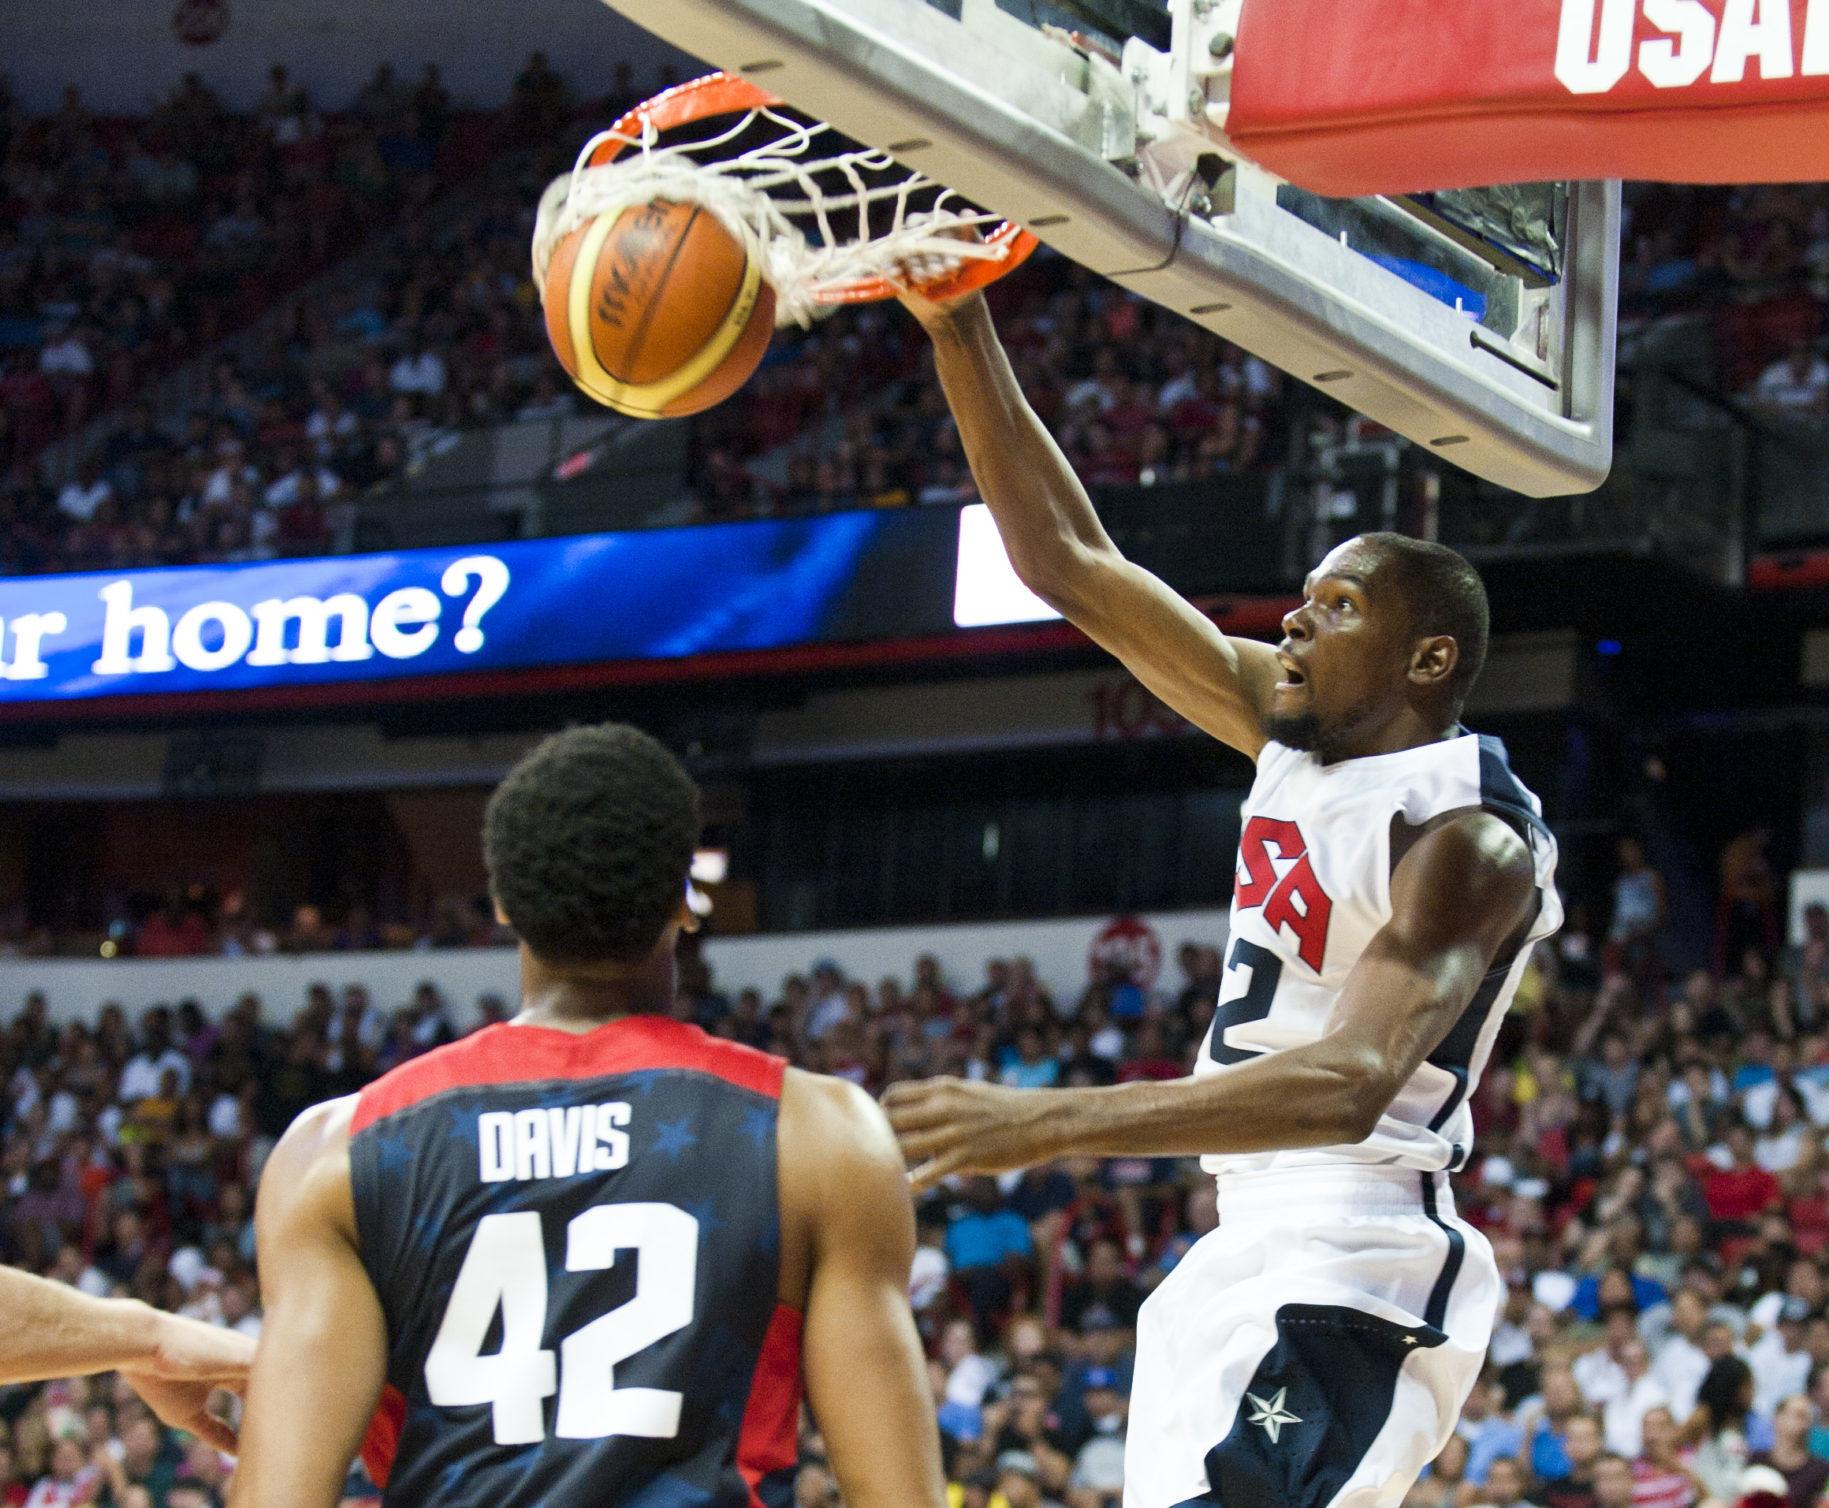 Kevin_Durant_dunks_USA_basketball_2015_140801-F-AT963-843